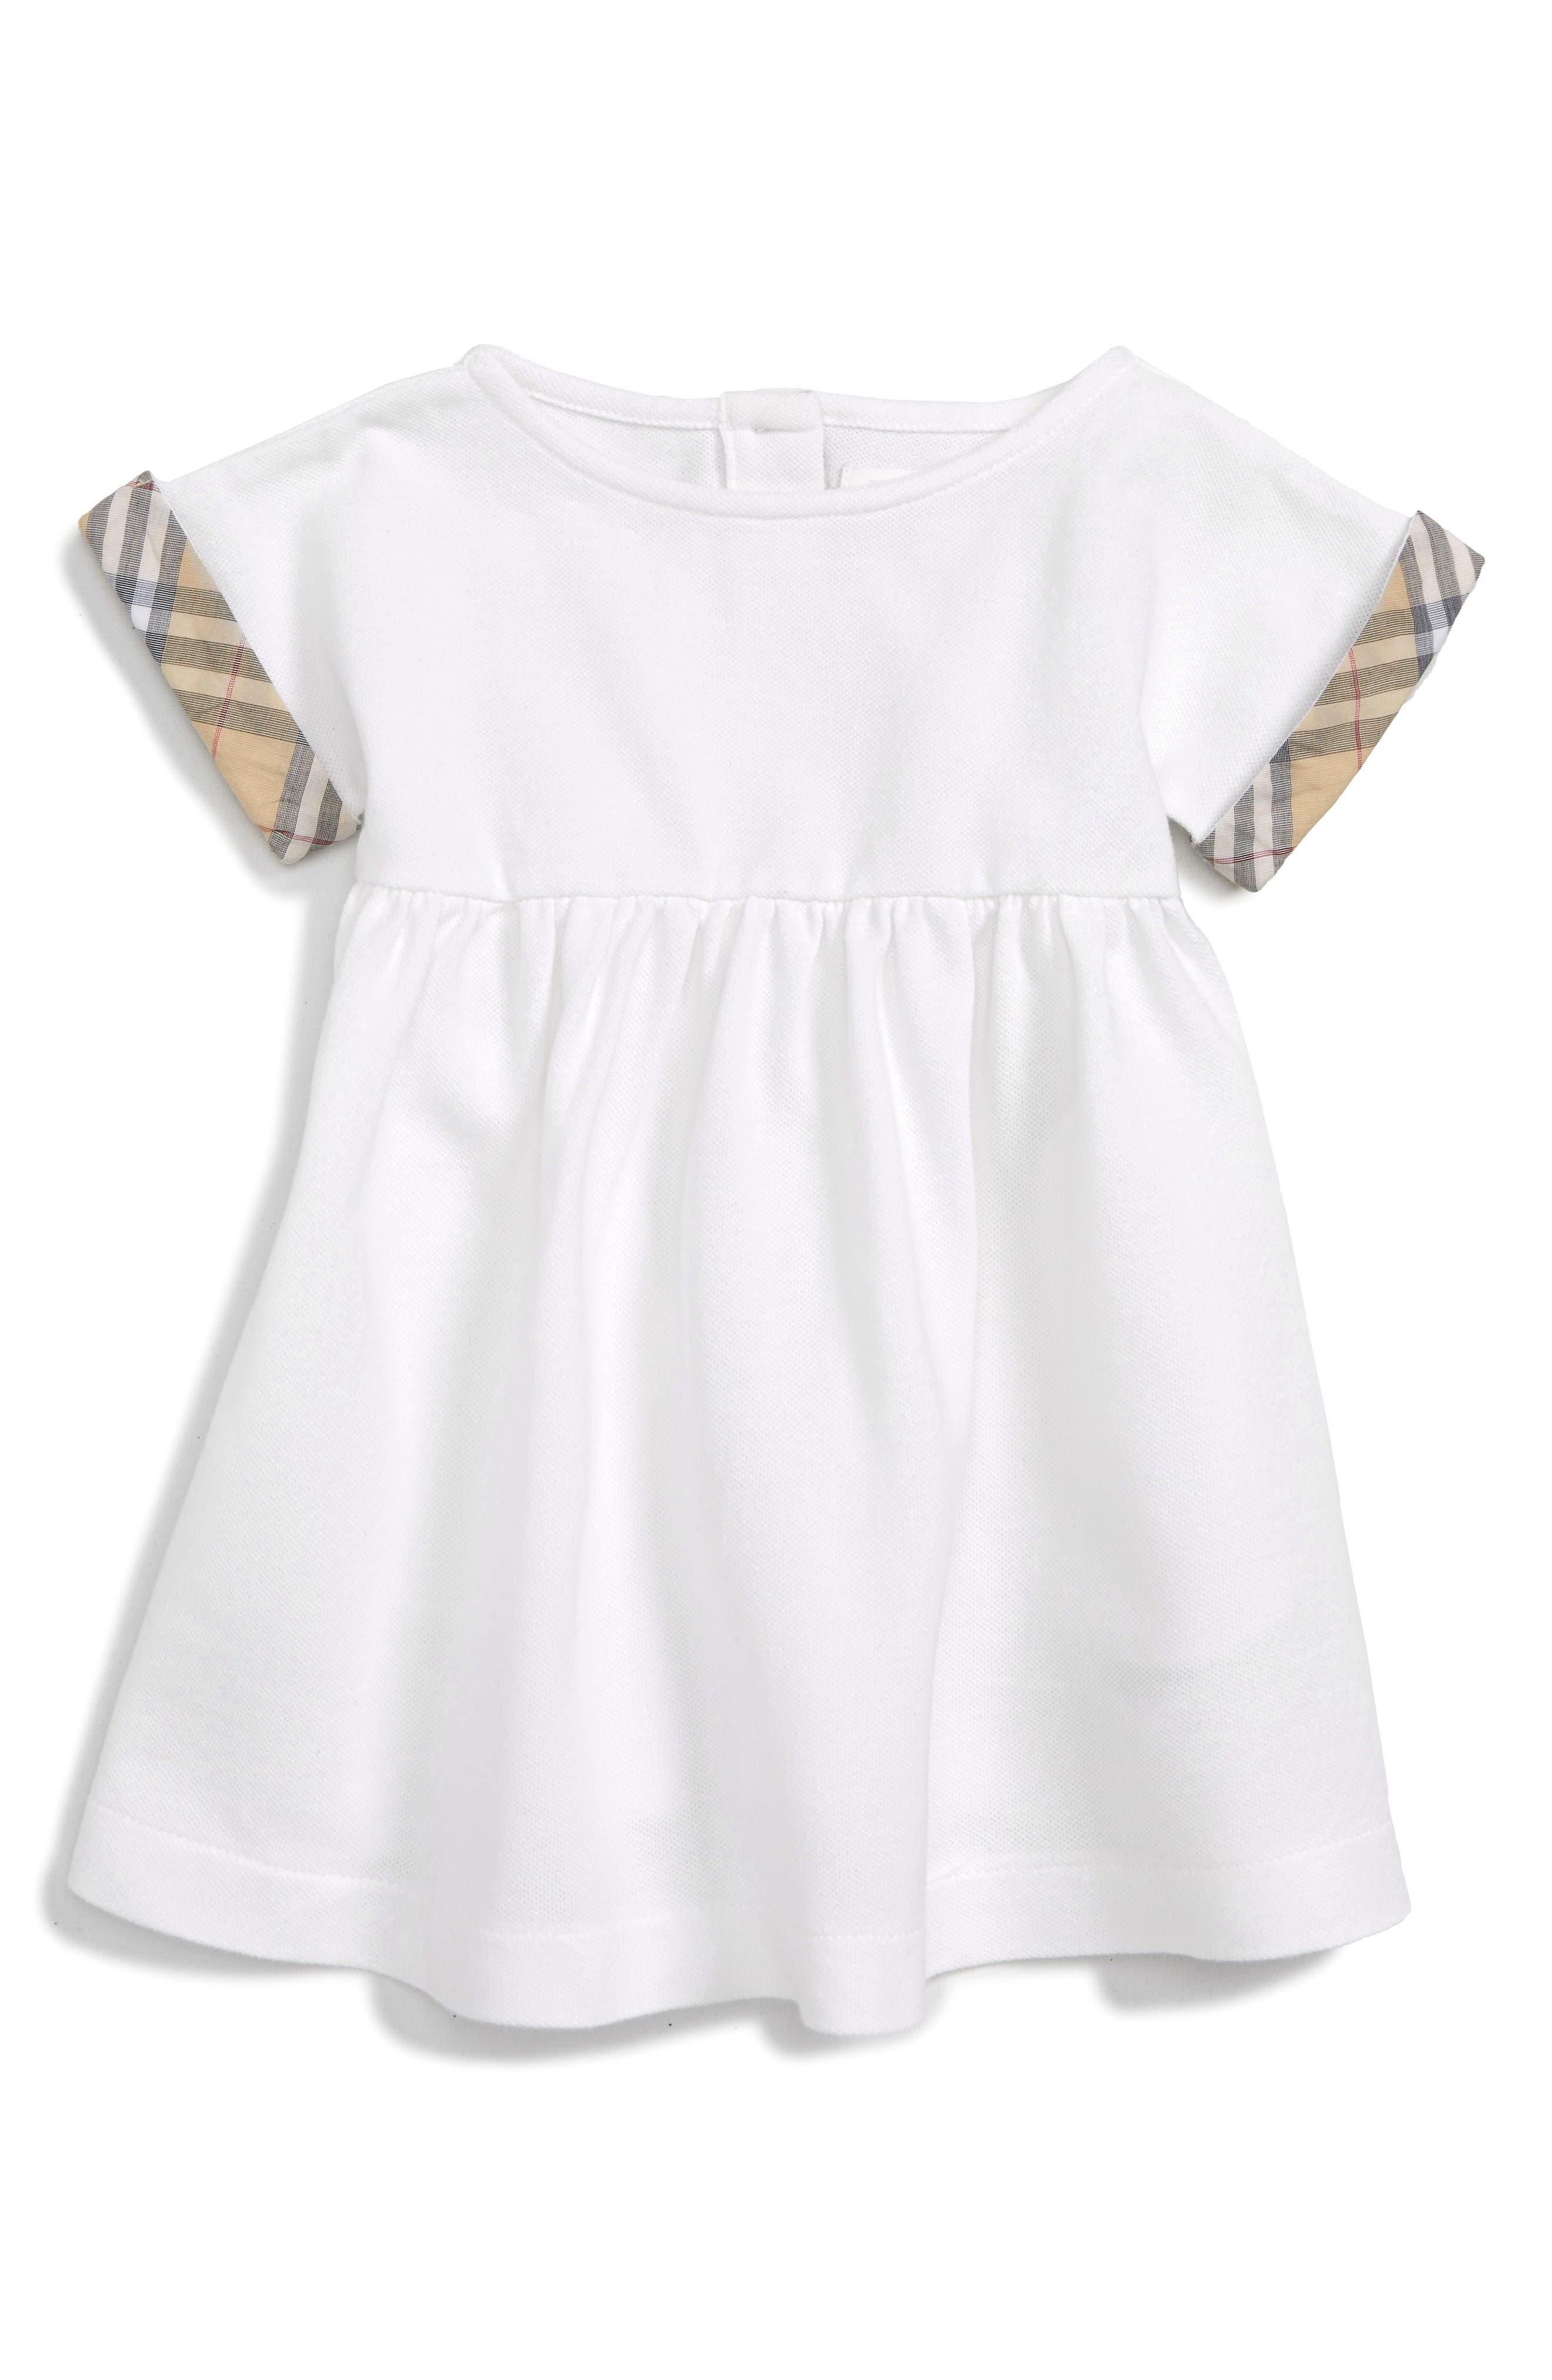 Jen Check Cuff Dress,                             Main thumbnail 1, color,                             White